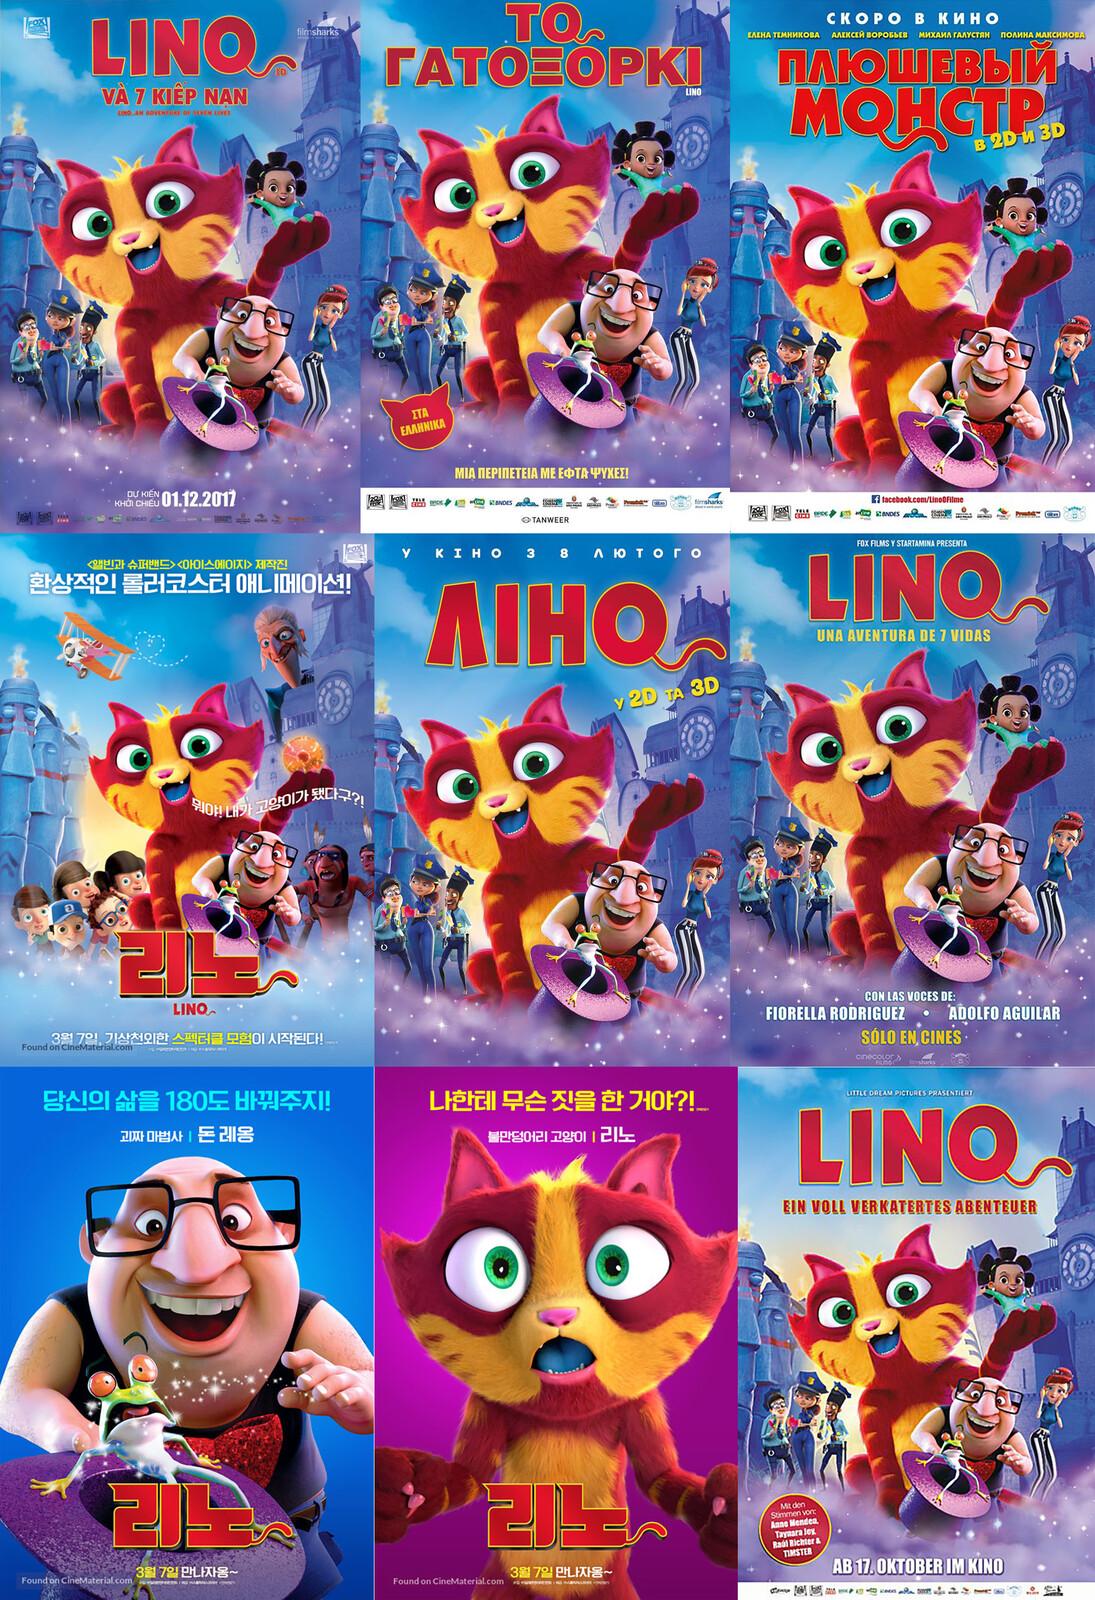 Movie posters around the world.